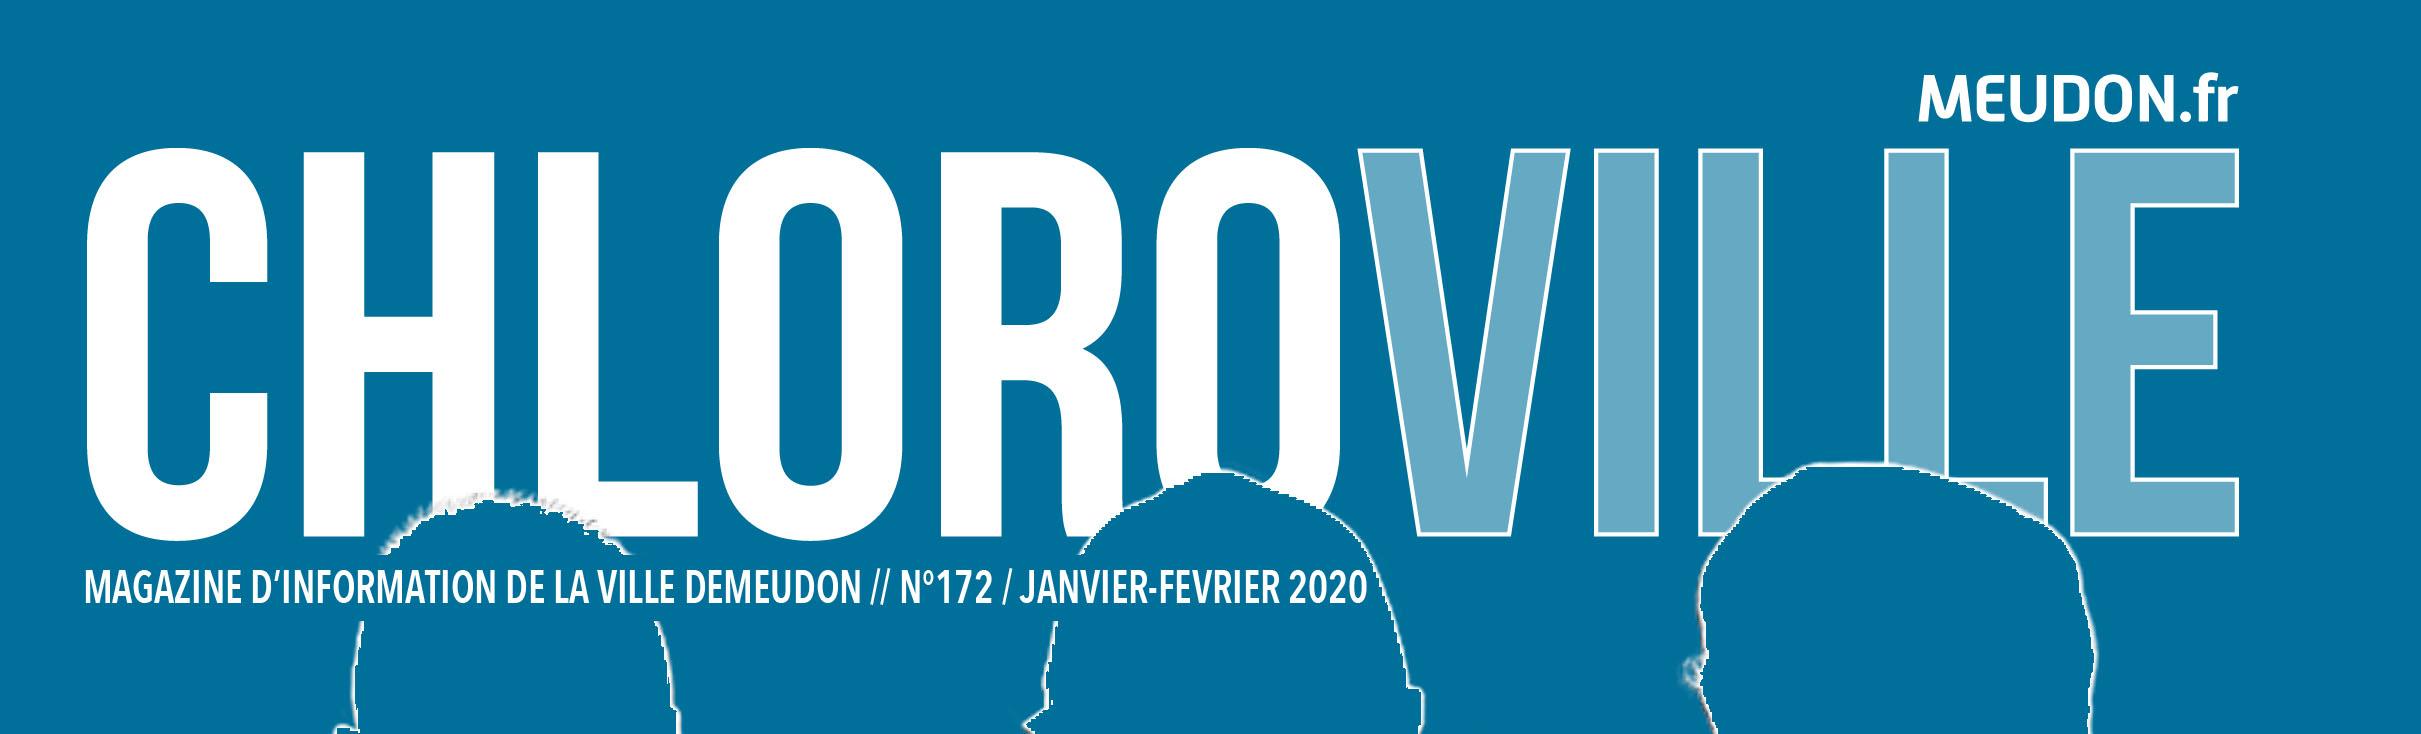 Chloroville janvier 2020